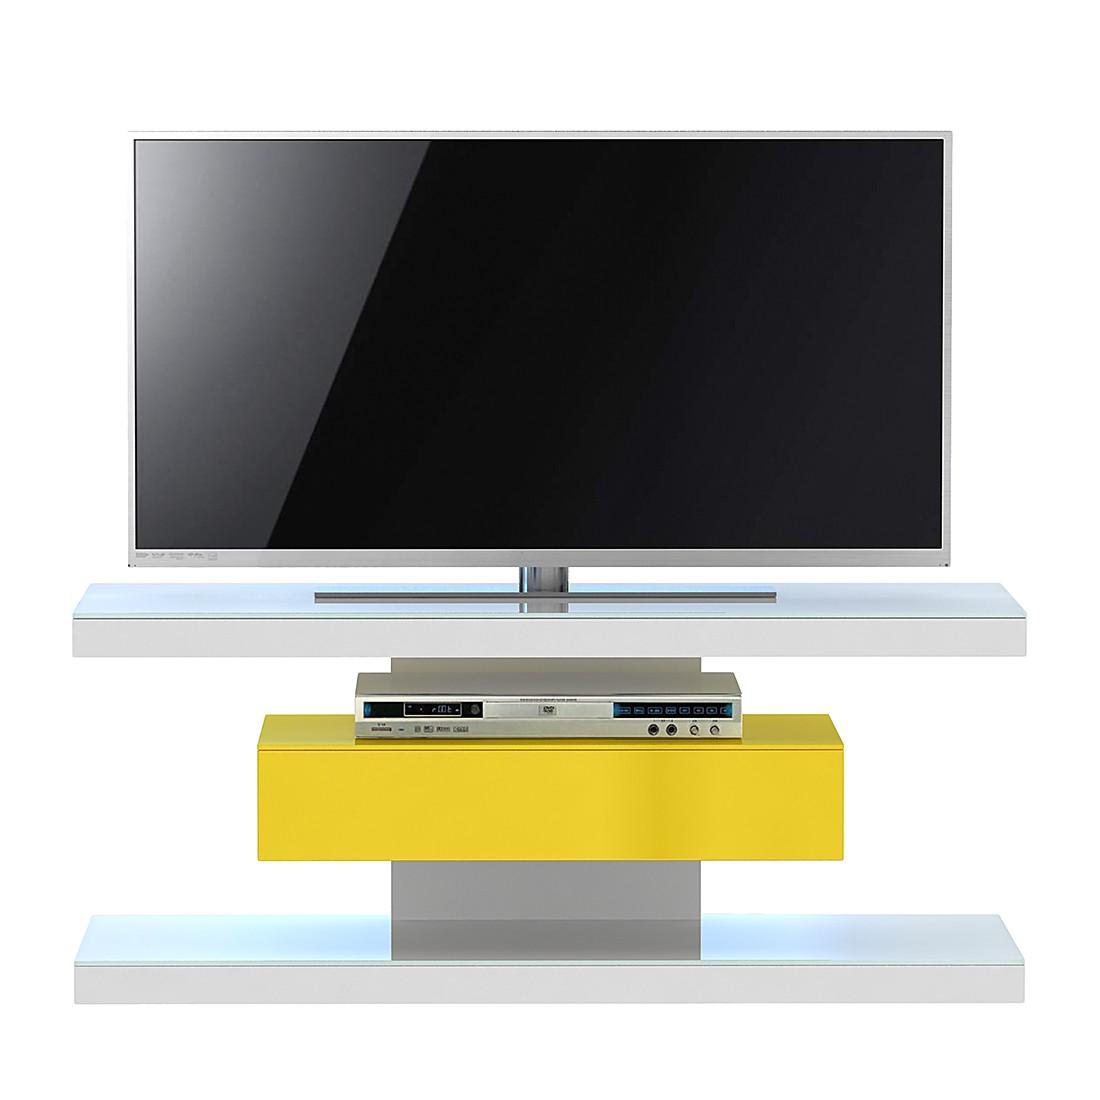 TV-Rack SL 610 - Weiß / Gelb, Jahnke